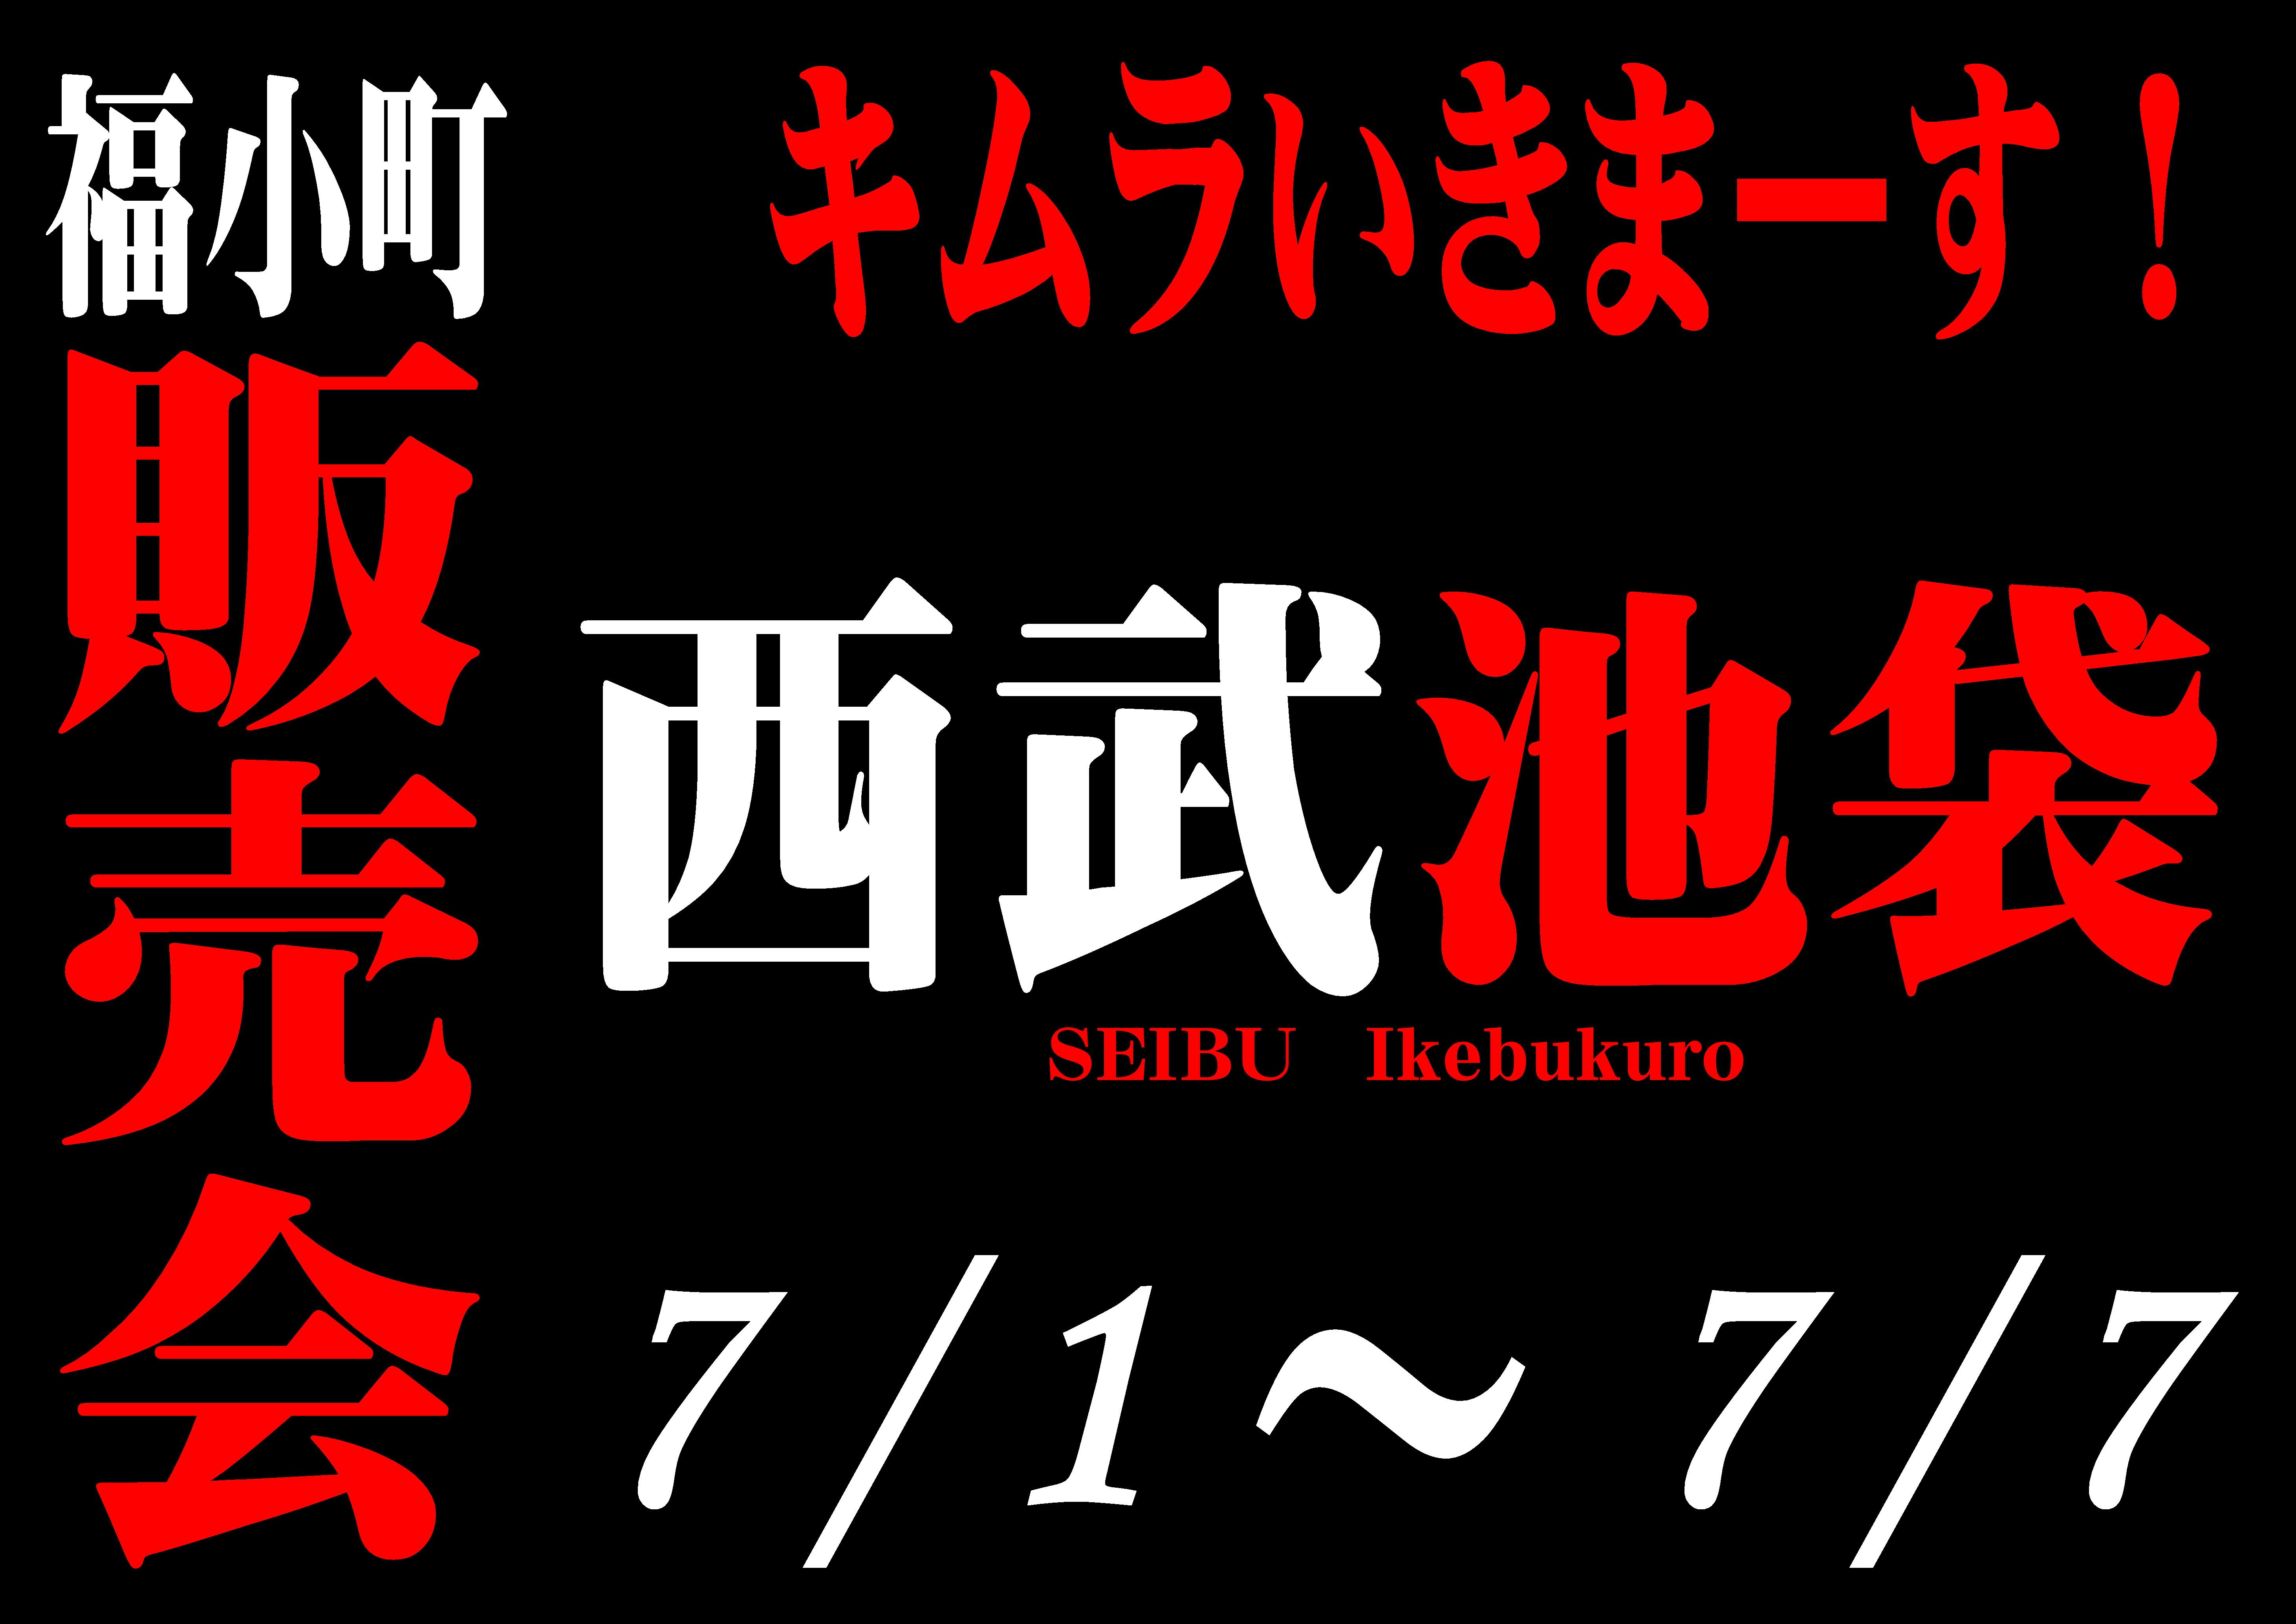 http://www.fukukomachi.com/blog/photo/20200630.JPG